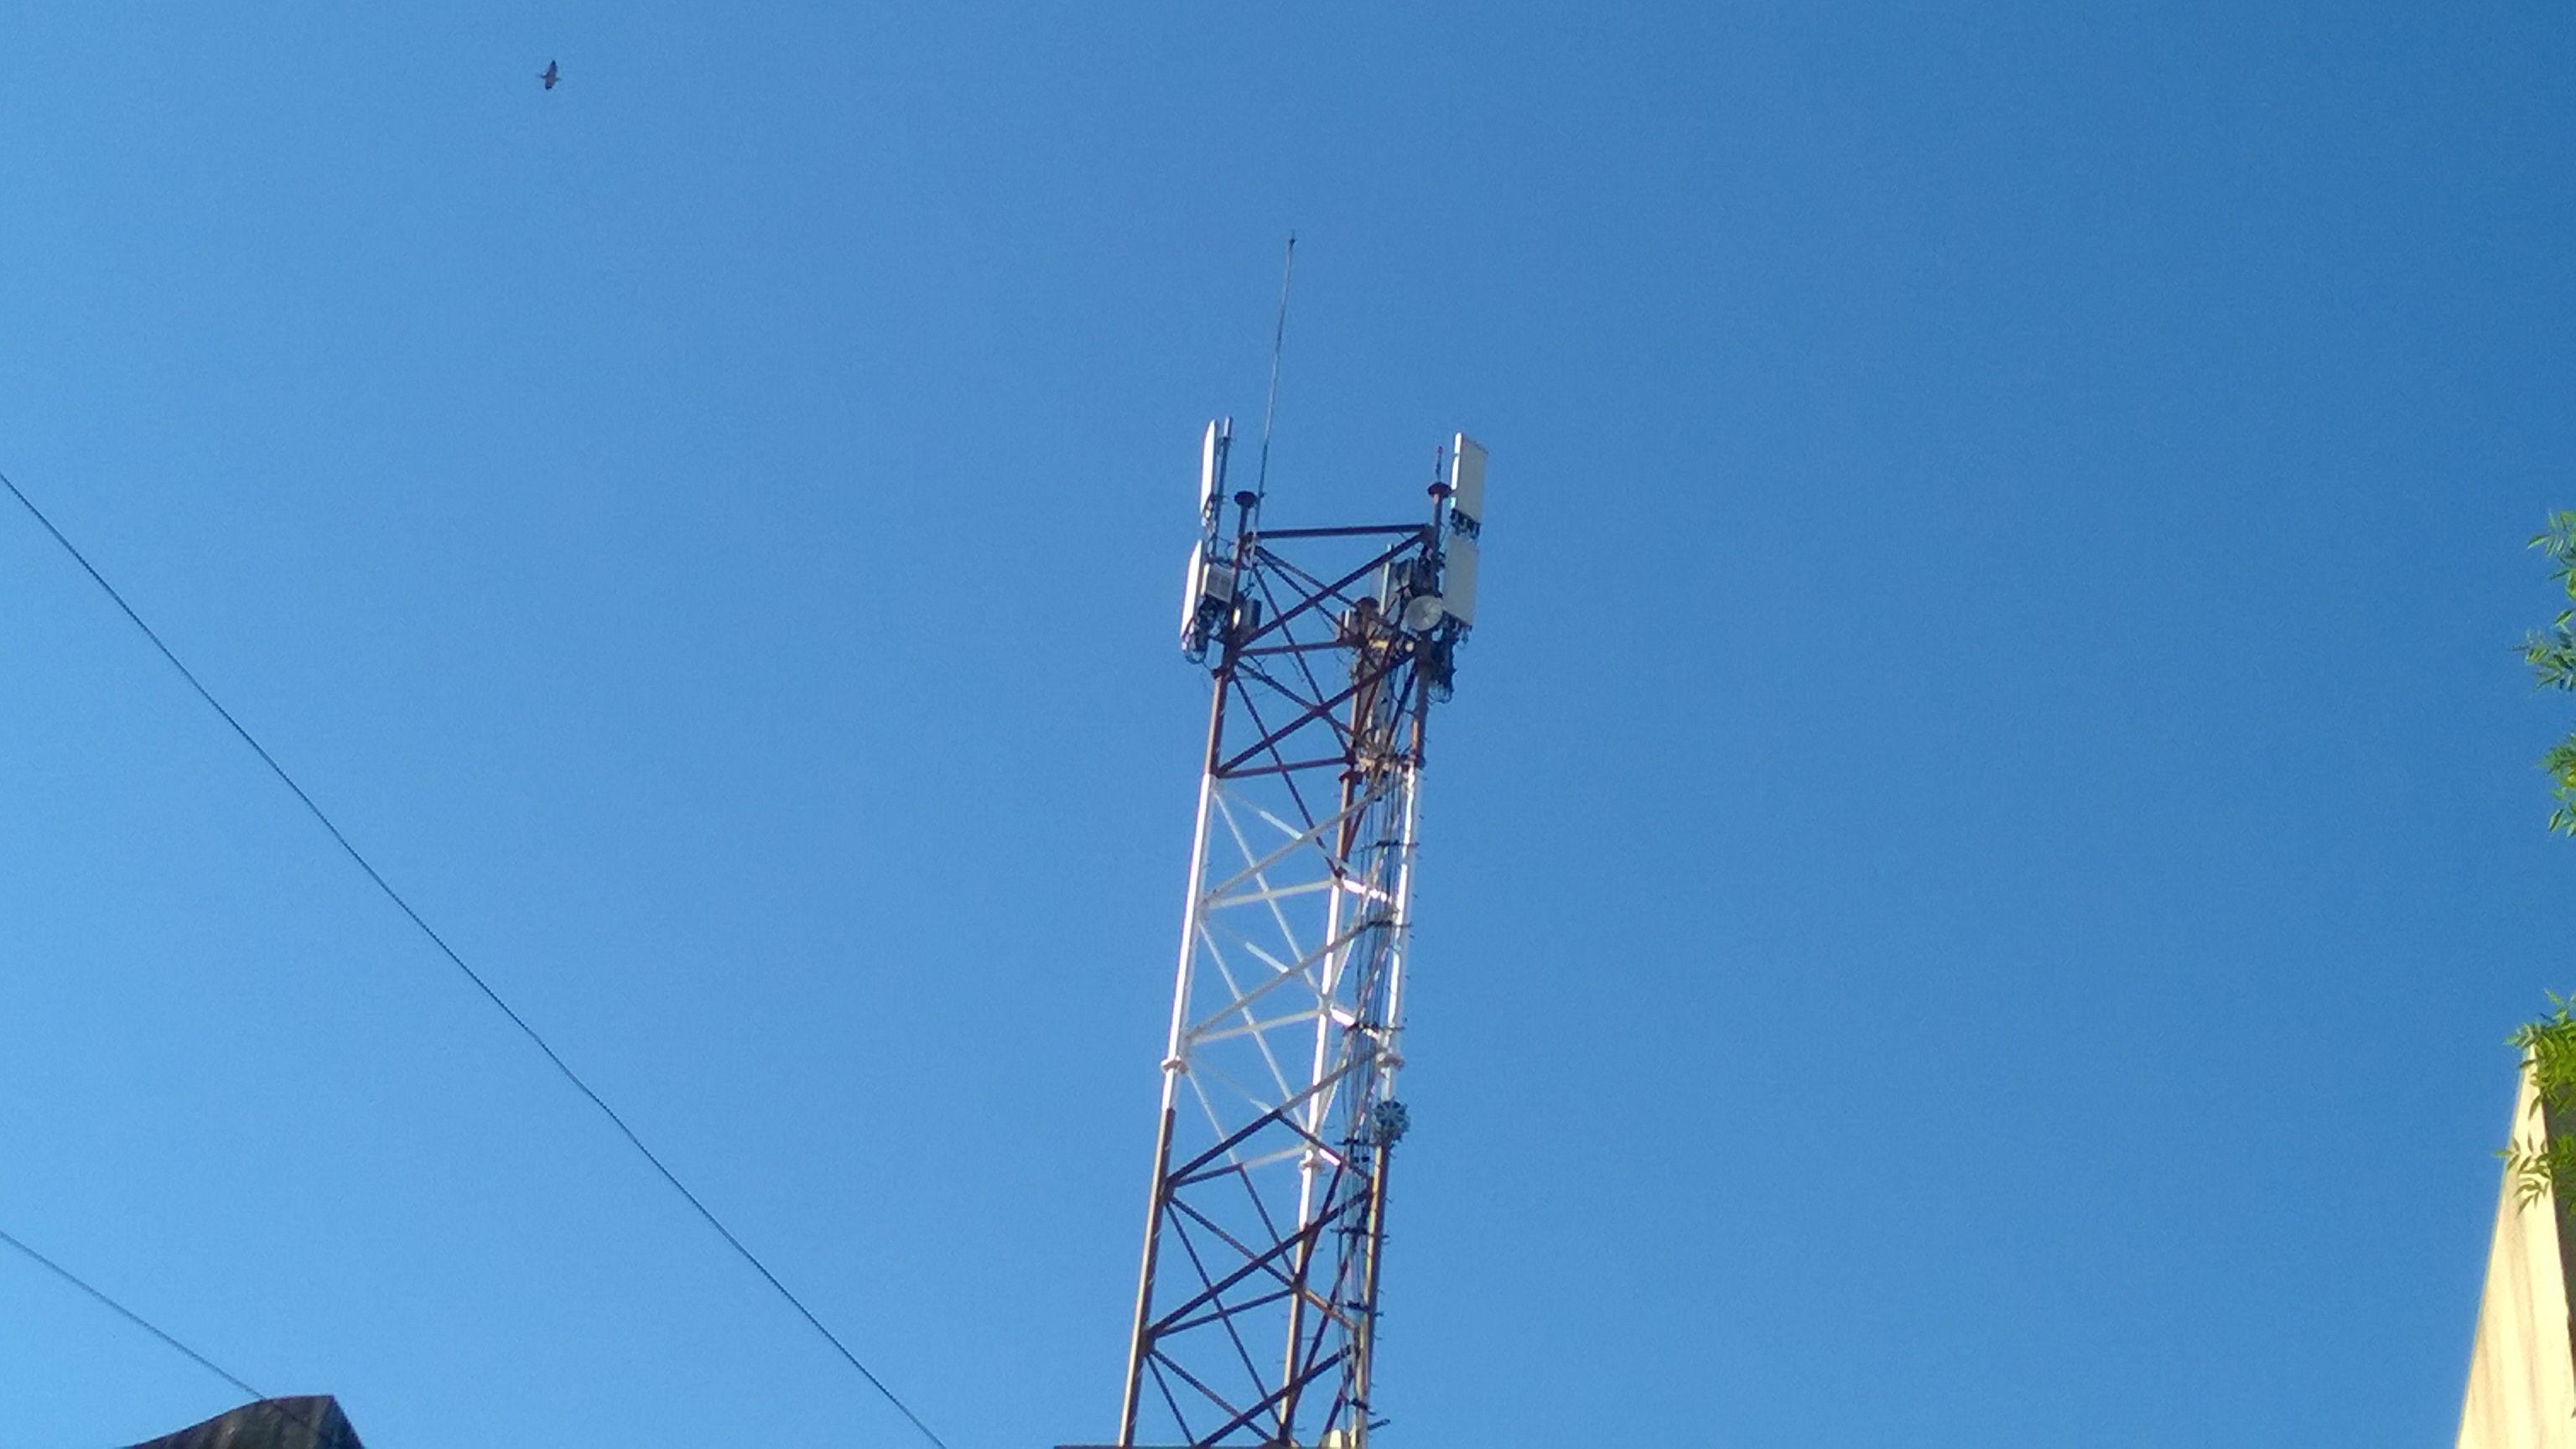 #4G #LTE Zone  #Almagro, #BuenosAires, #Argentina